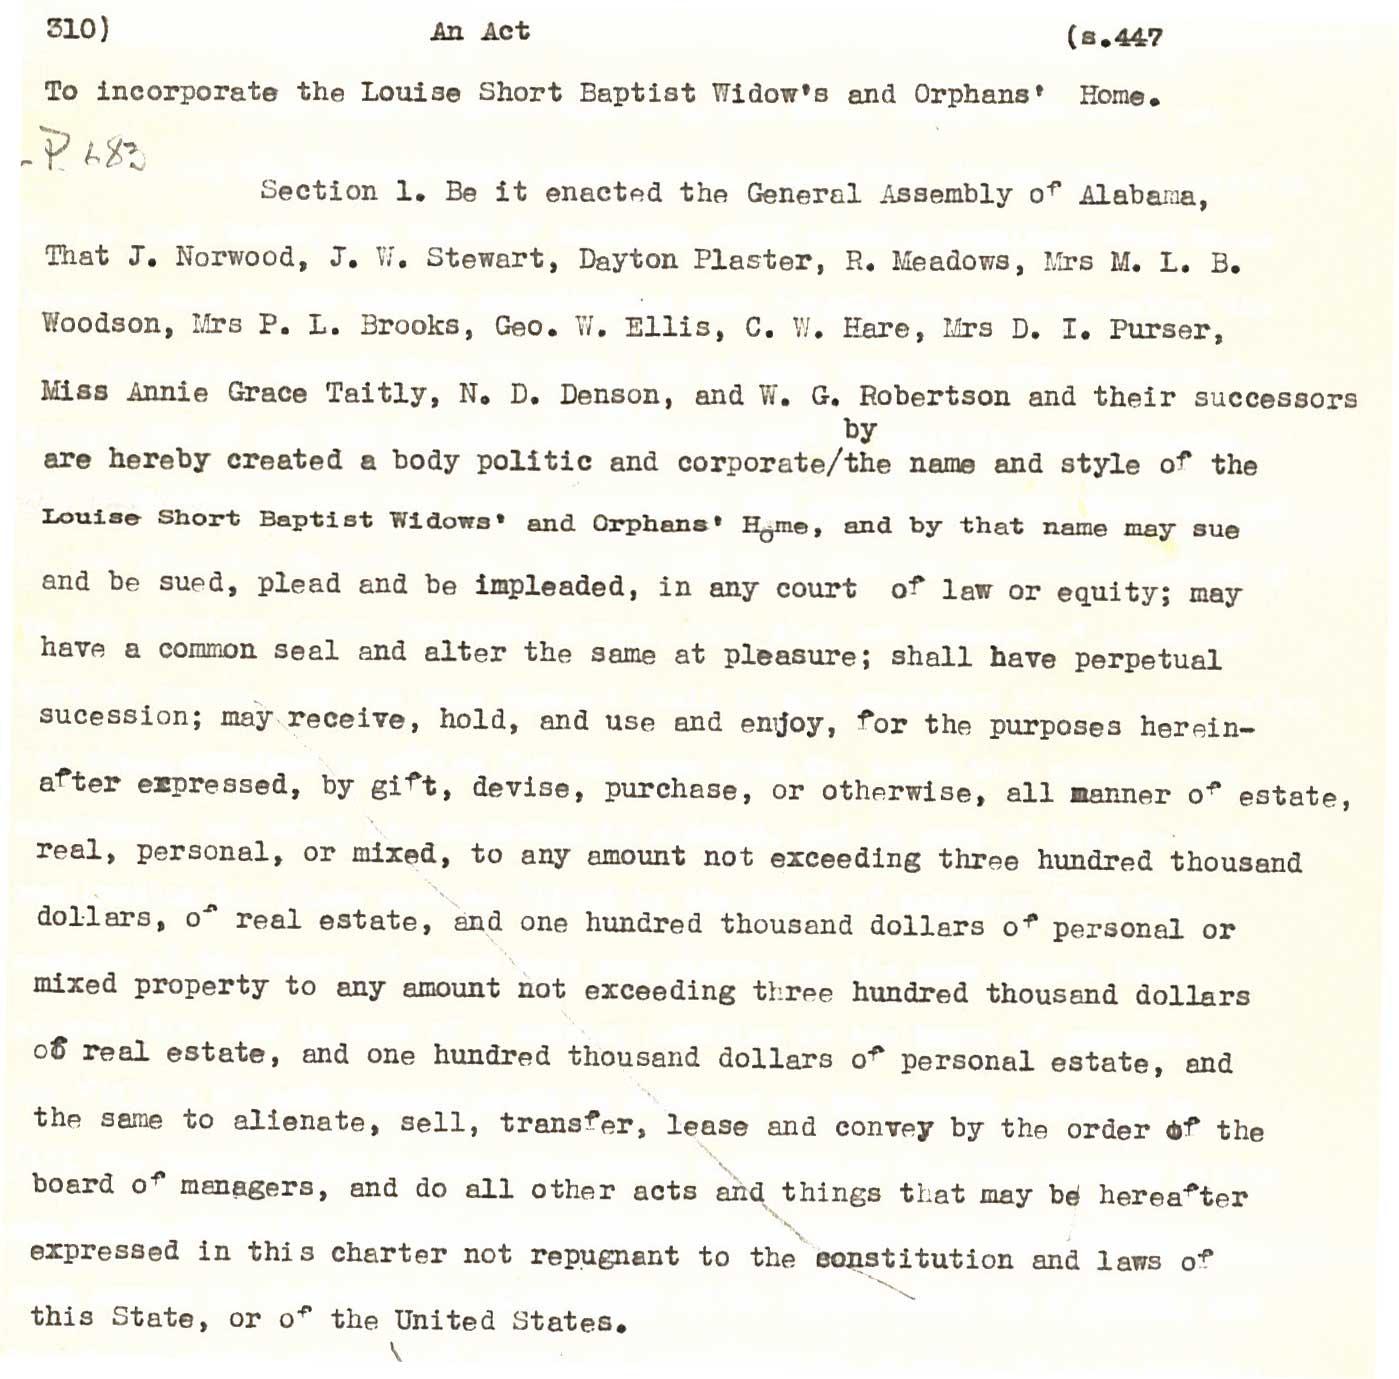 Original charter from 1891